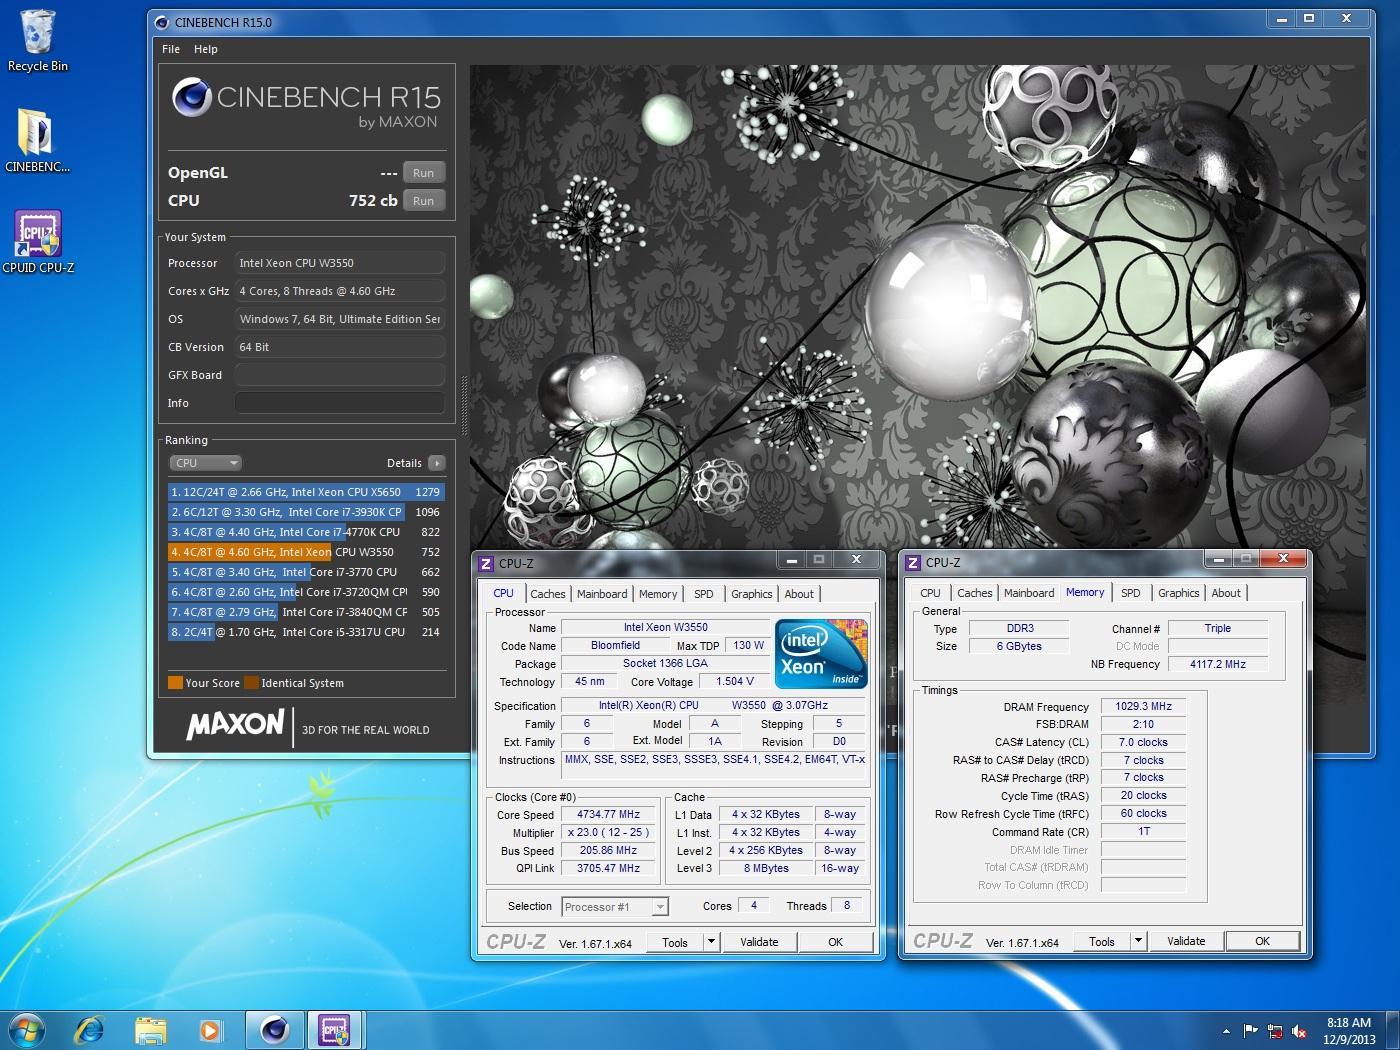 Aleslammer`s Cinebench - R15 score: 752 cb with a Xeon W3550